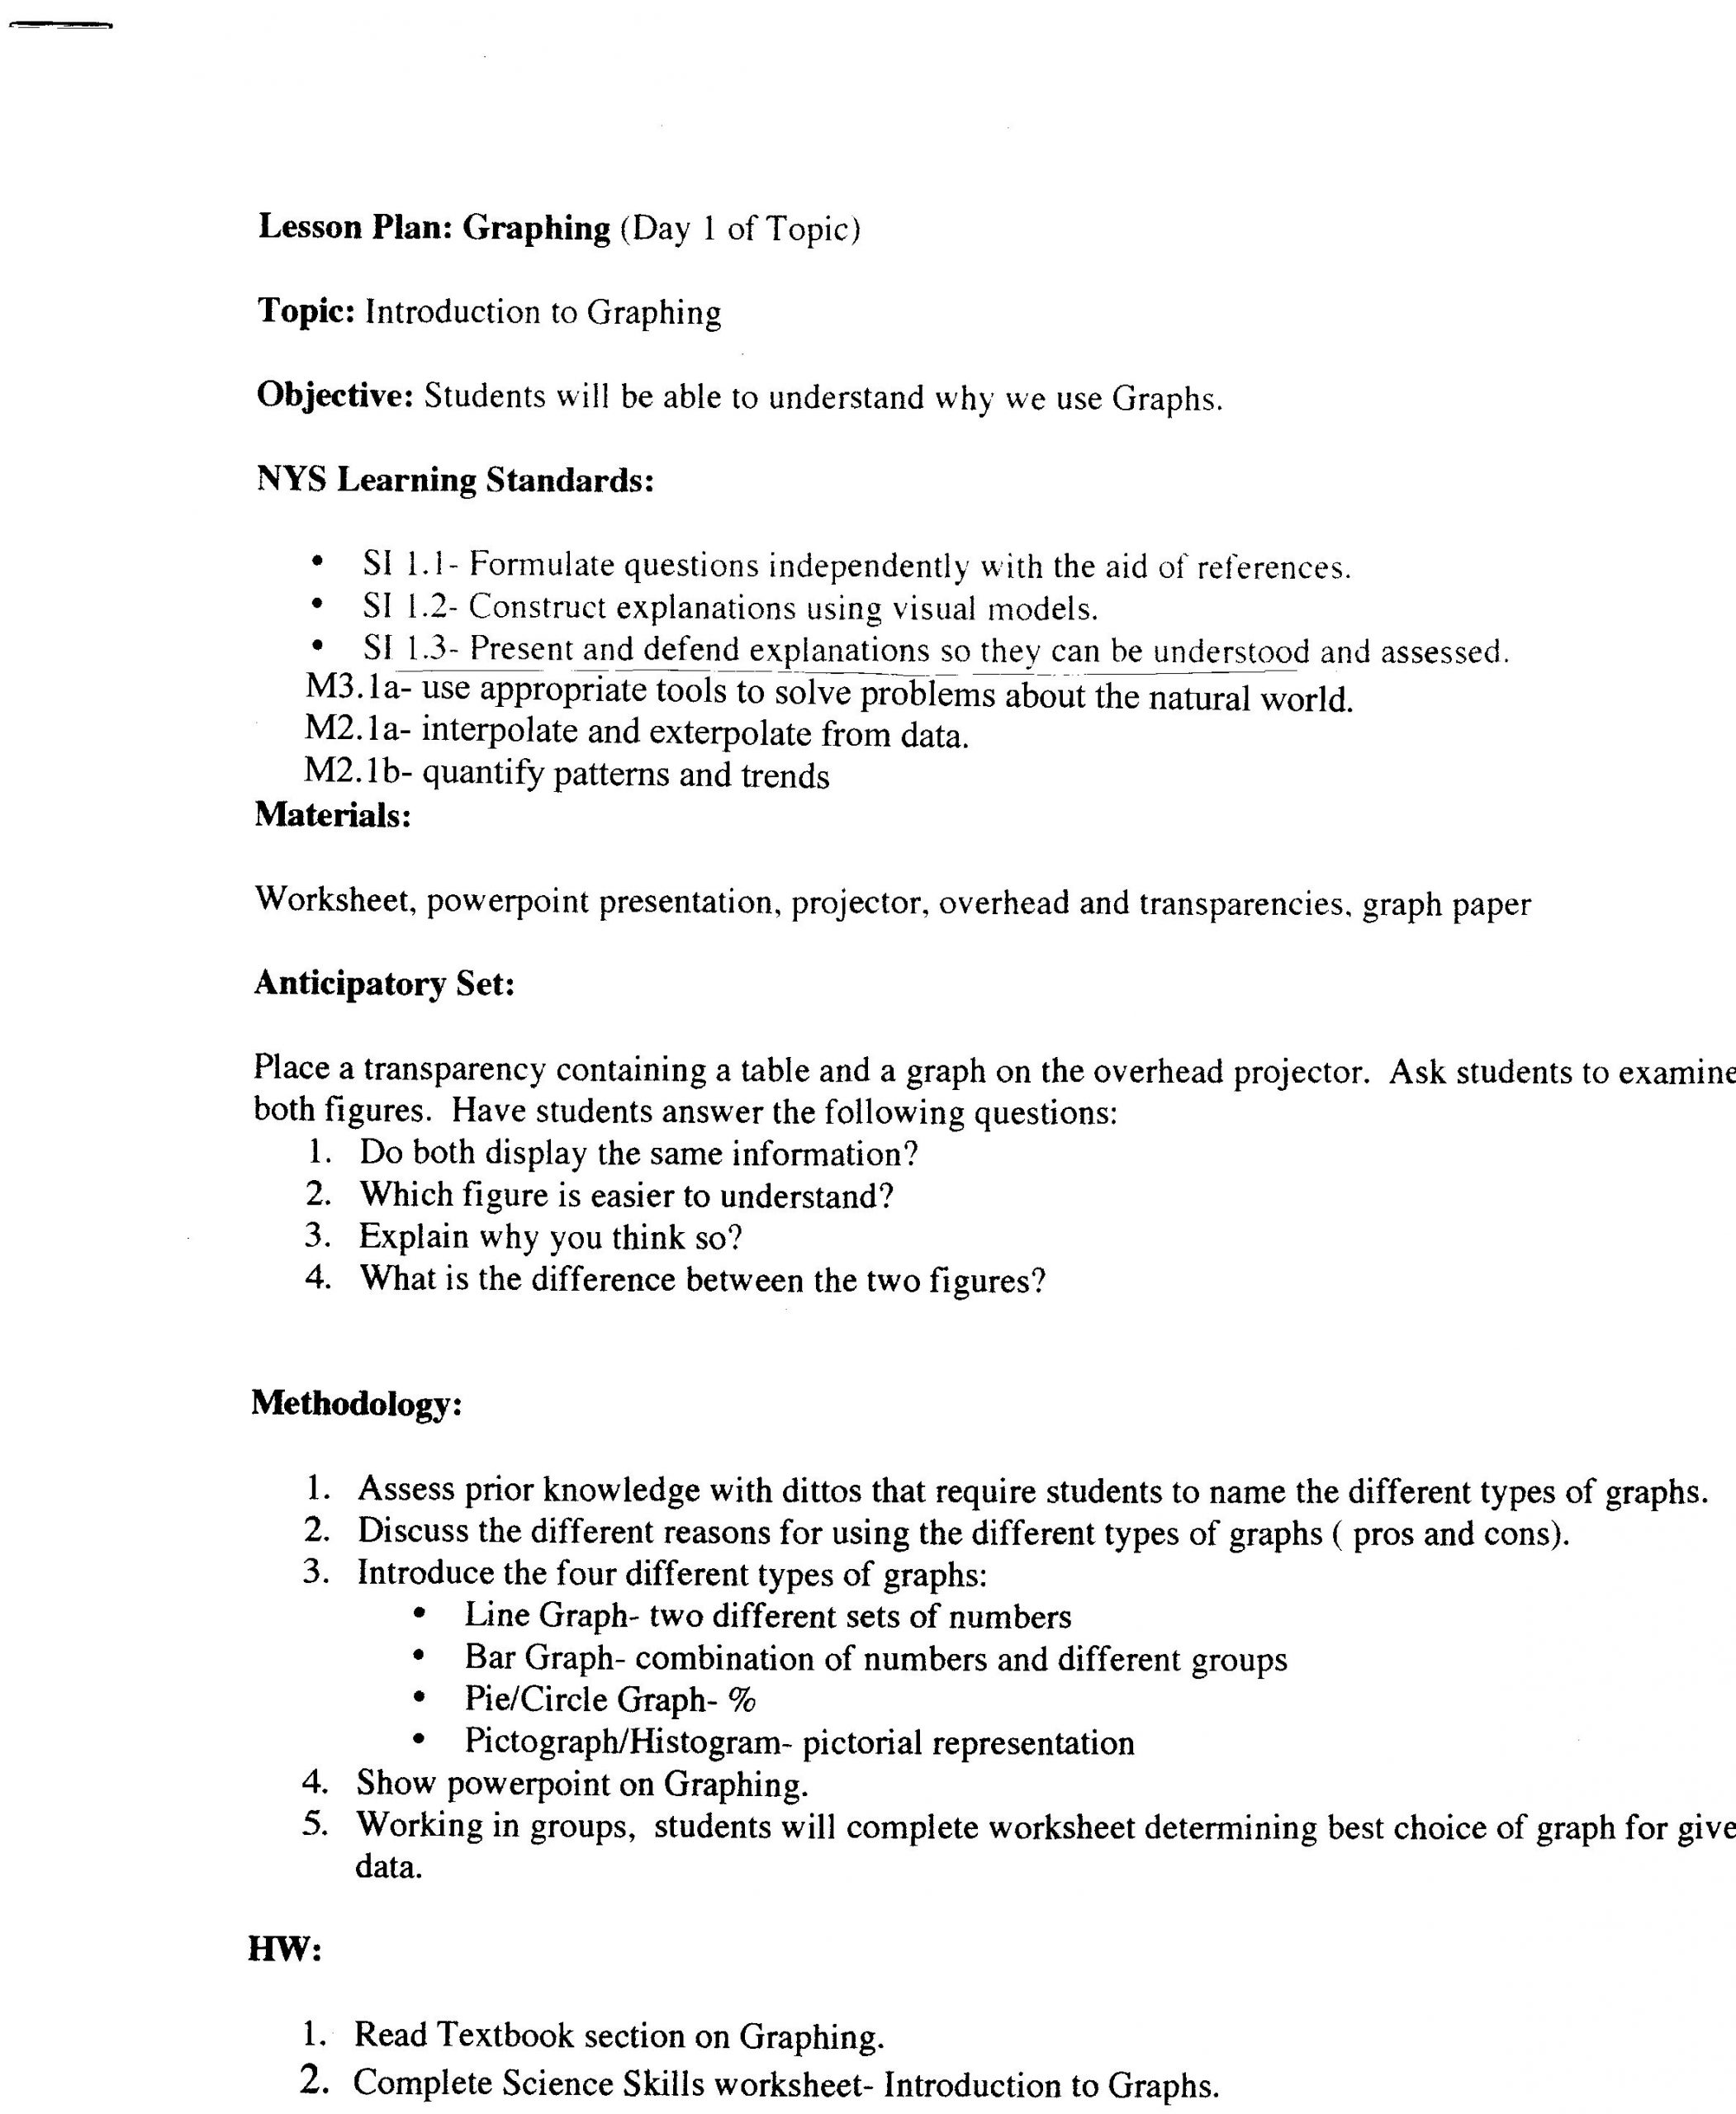 Science Skills Worksheet Answer Key Science Skills